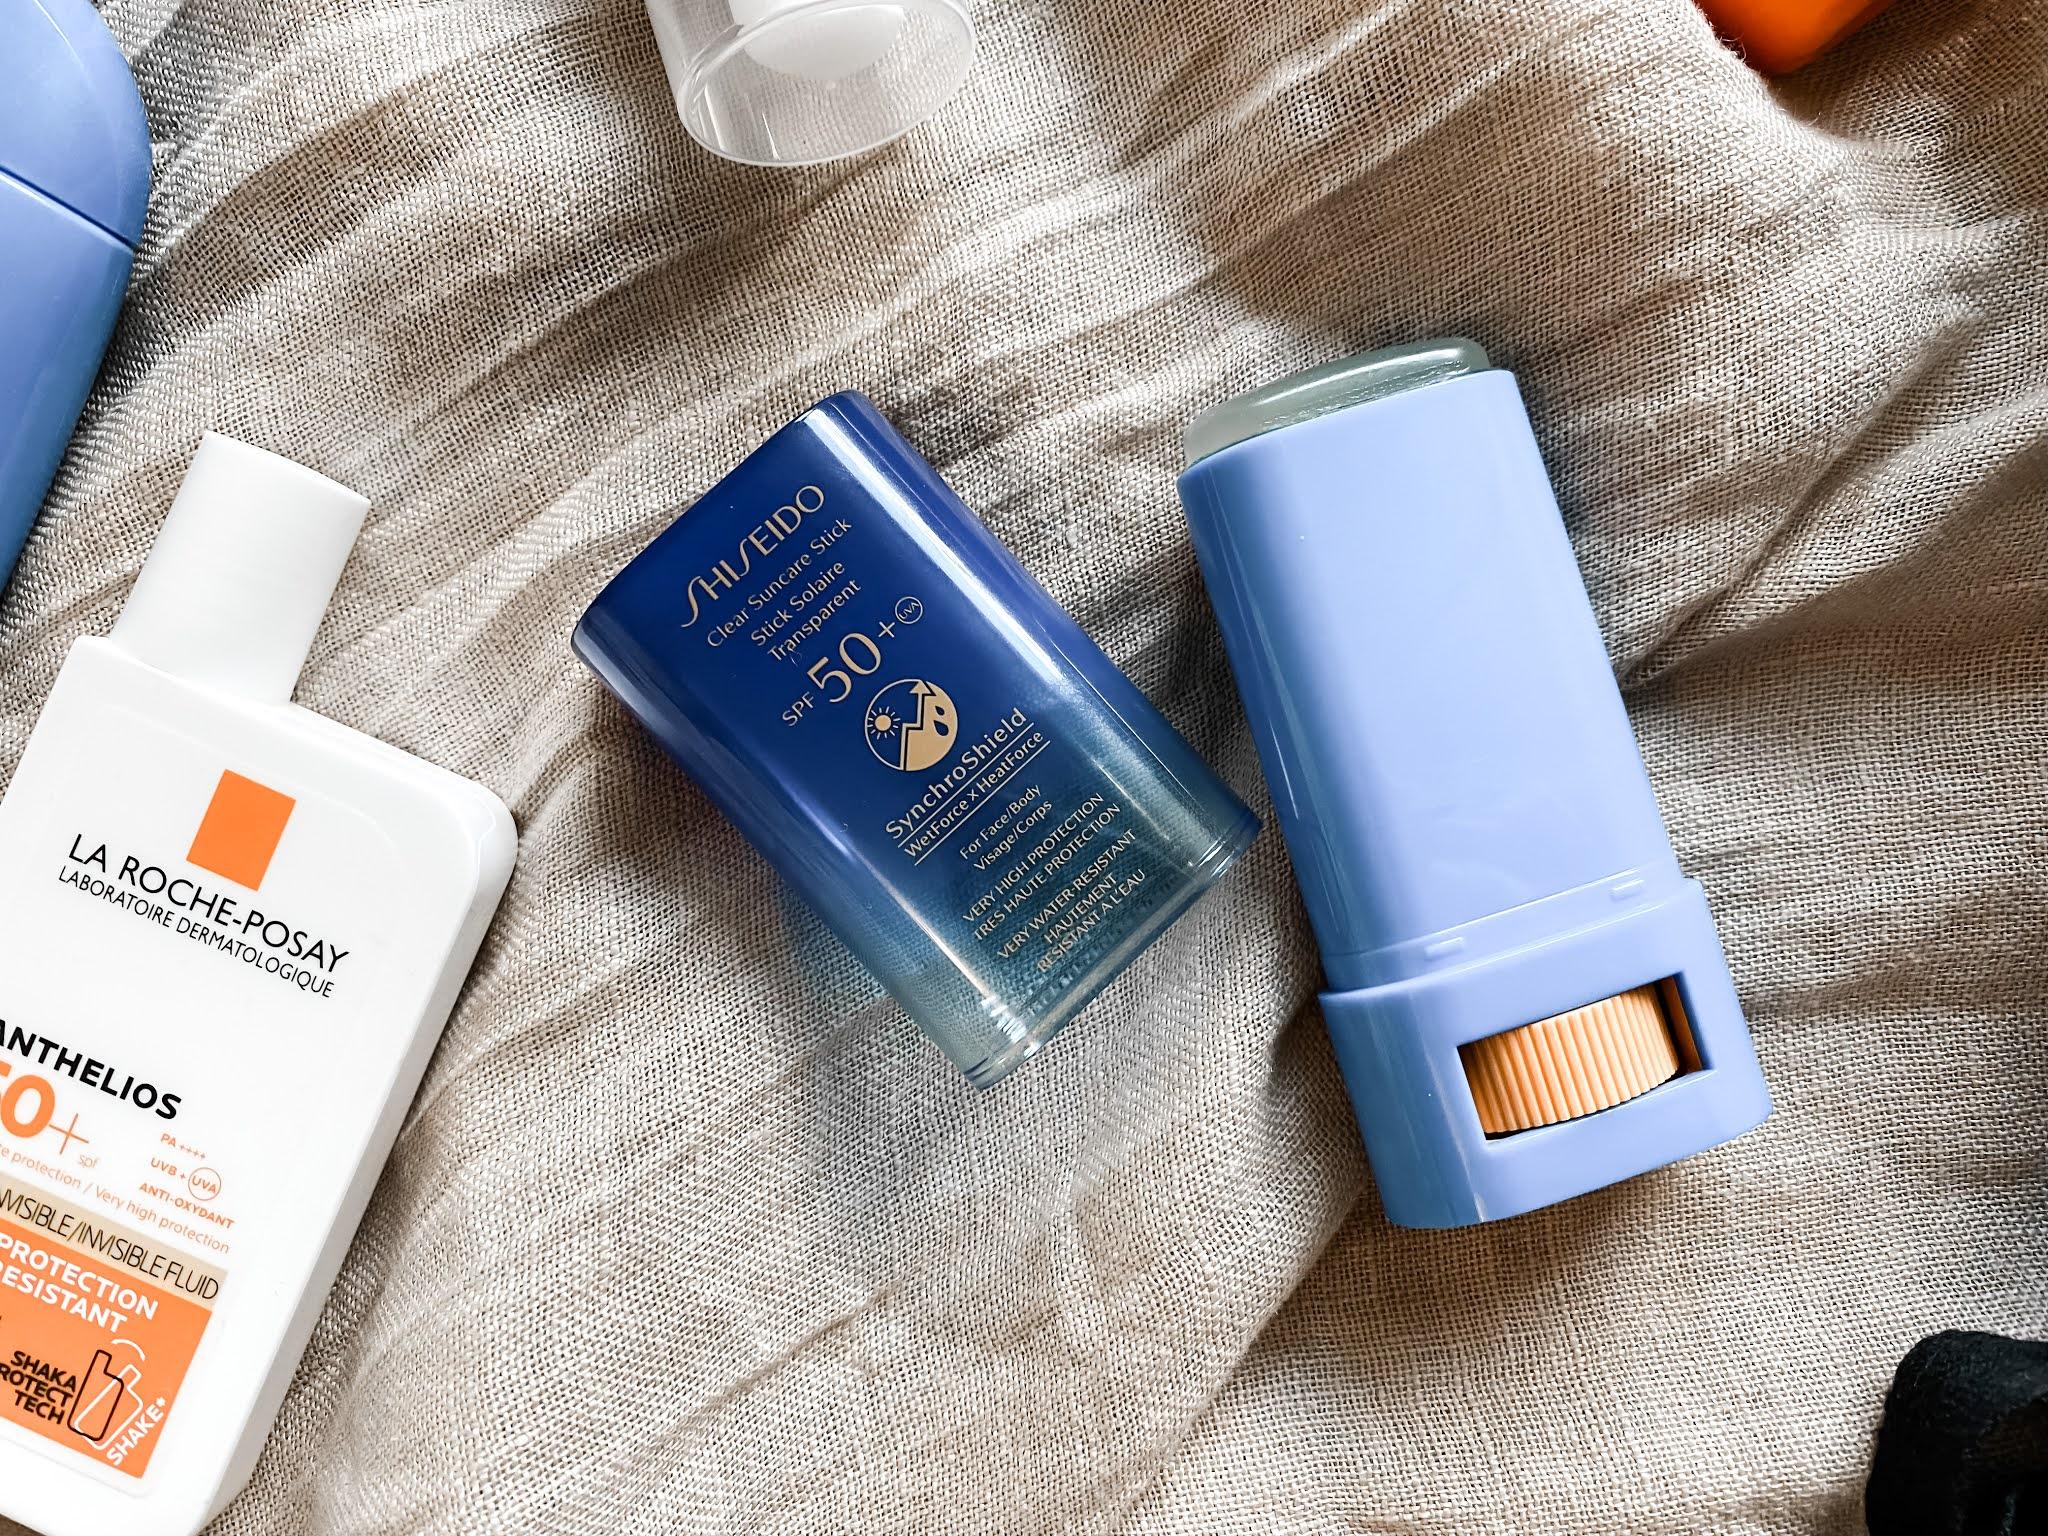 Shiseido Stick Summer Skincare Facial SPF Sunscreen Products